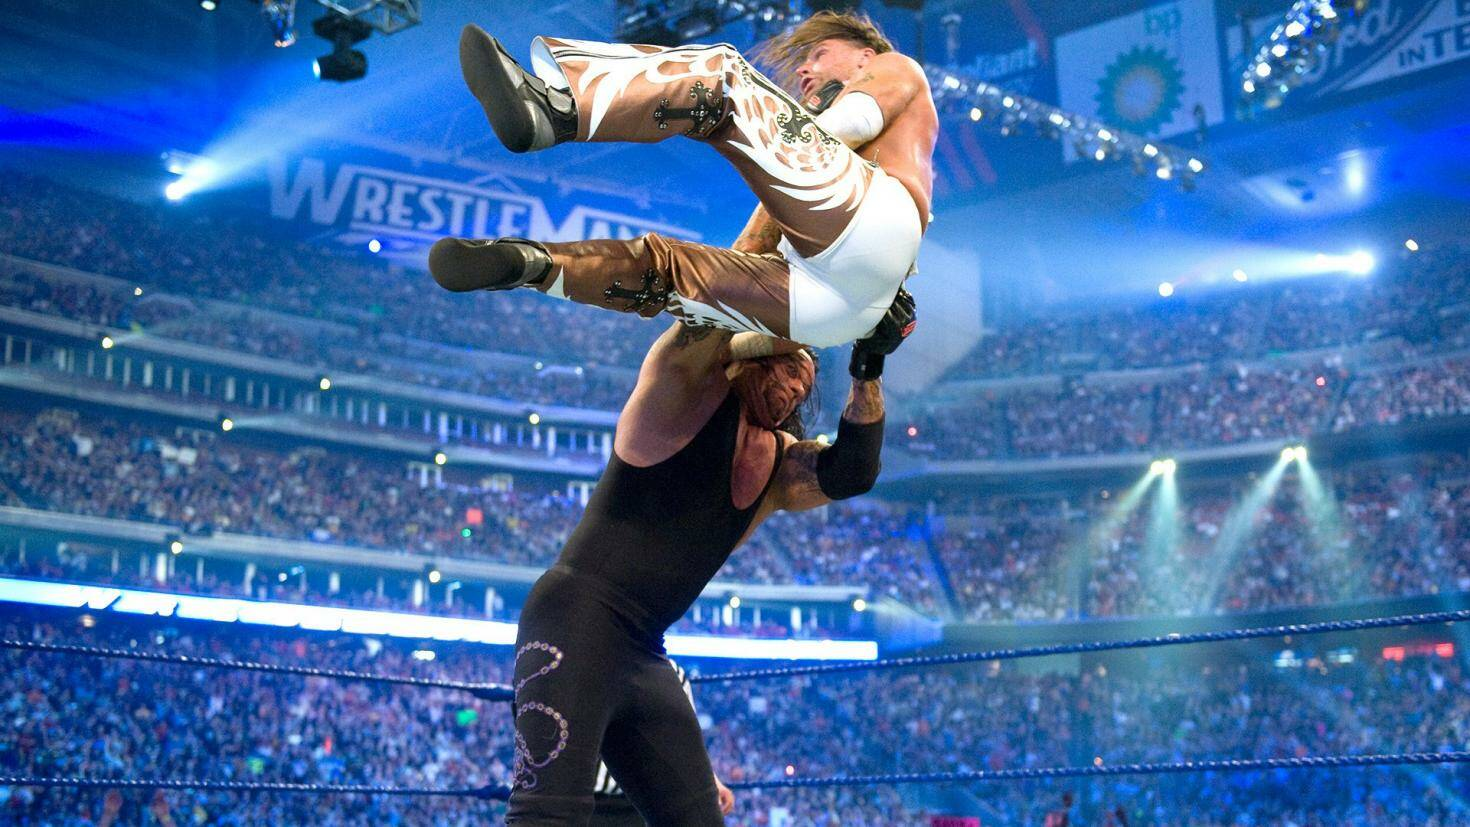 Shawn Michaels vs The Undertaker